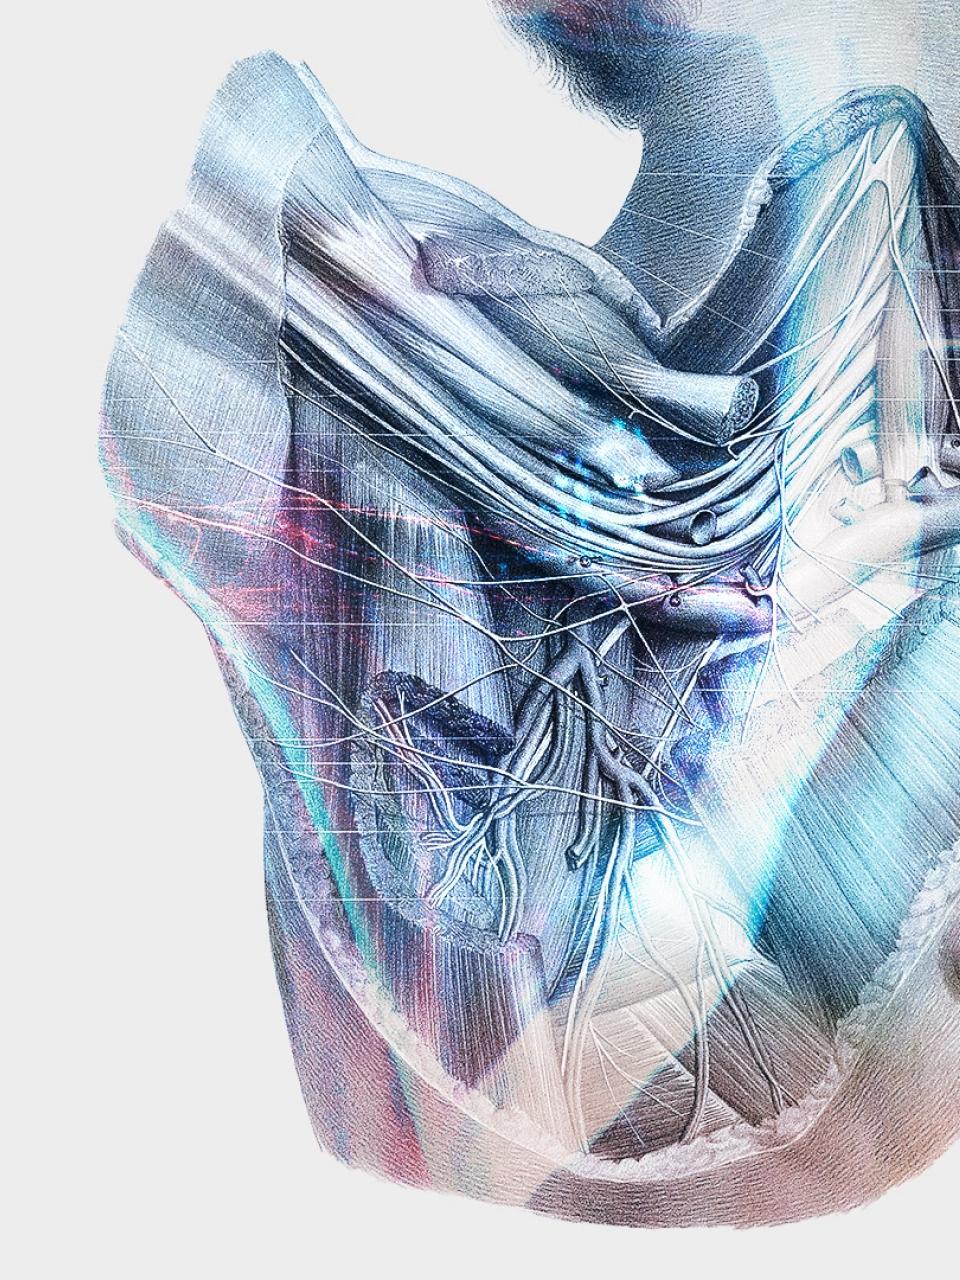 A solution to detect a brachial plexus on an ultrasound image